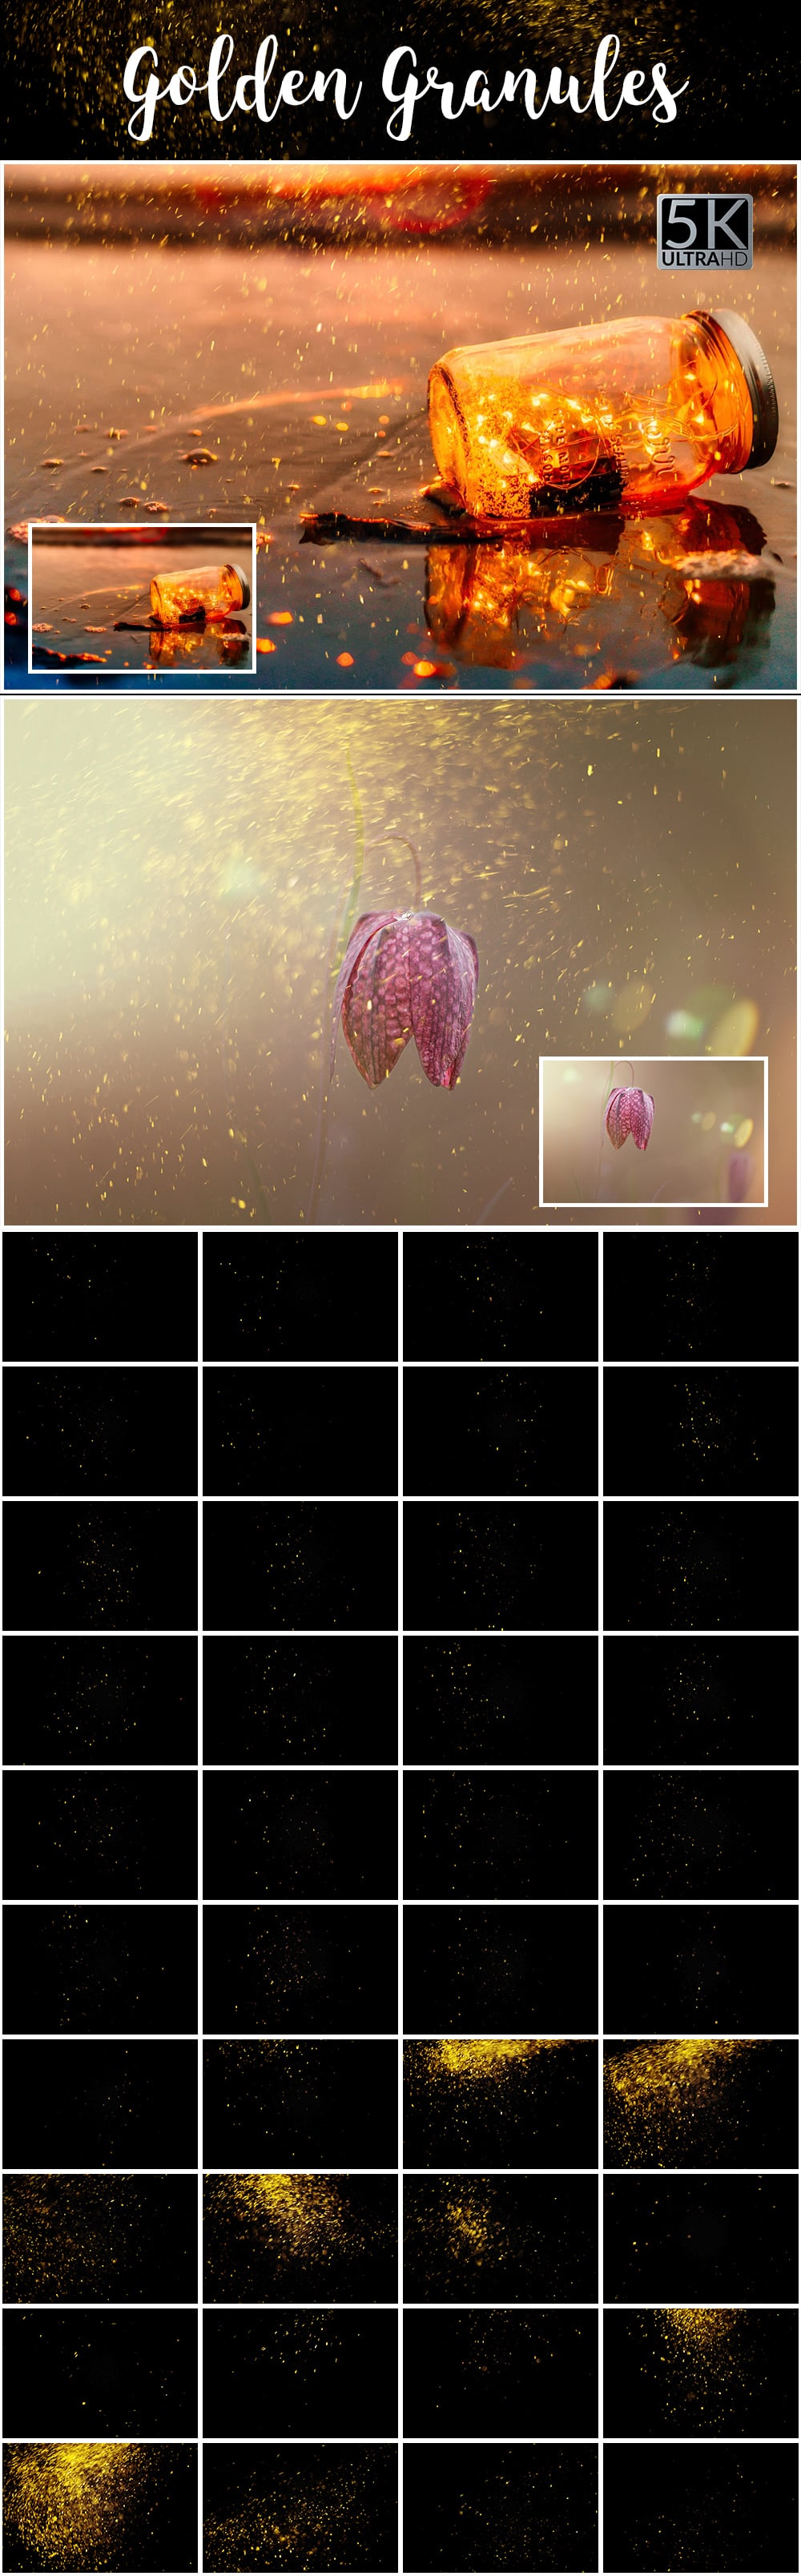 1100 Photoshop Overlays Mega Pack - Extended License - 18 Golden Granules